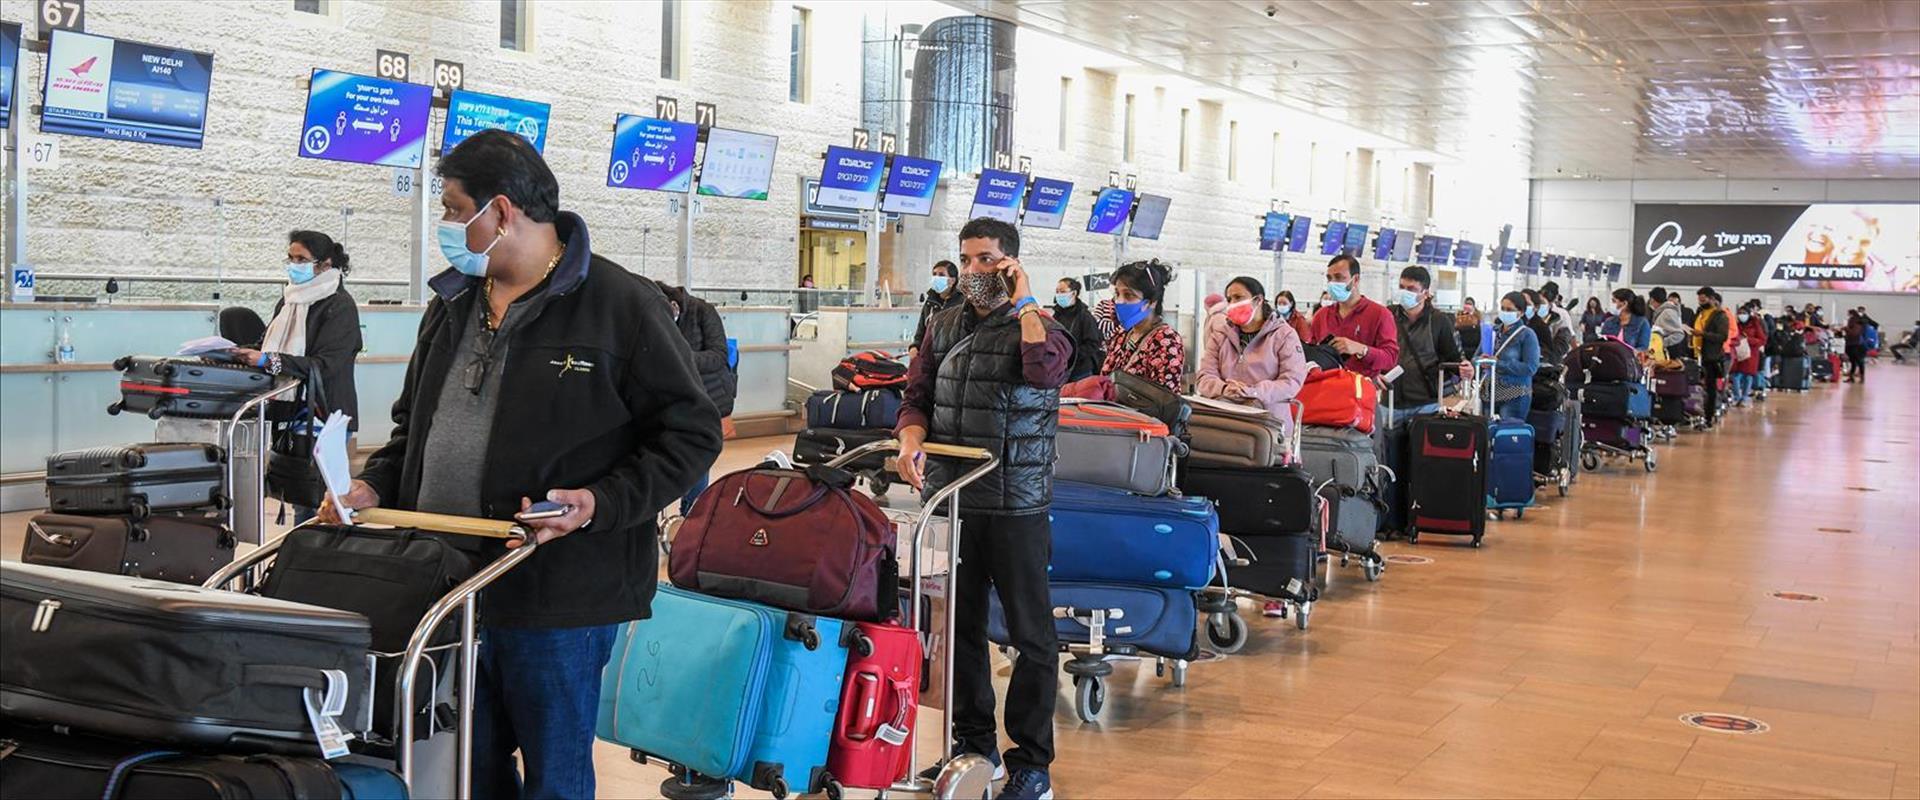 مطار بن غوريون الدولي